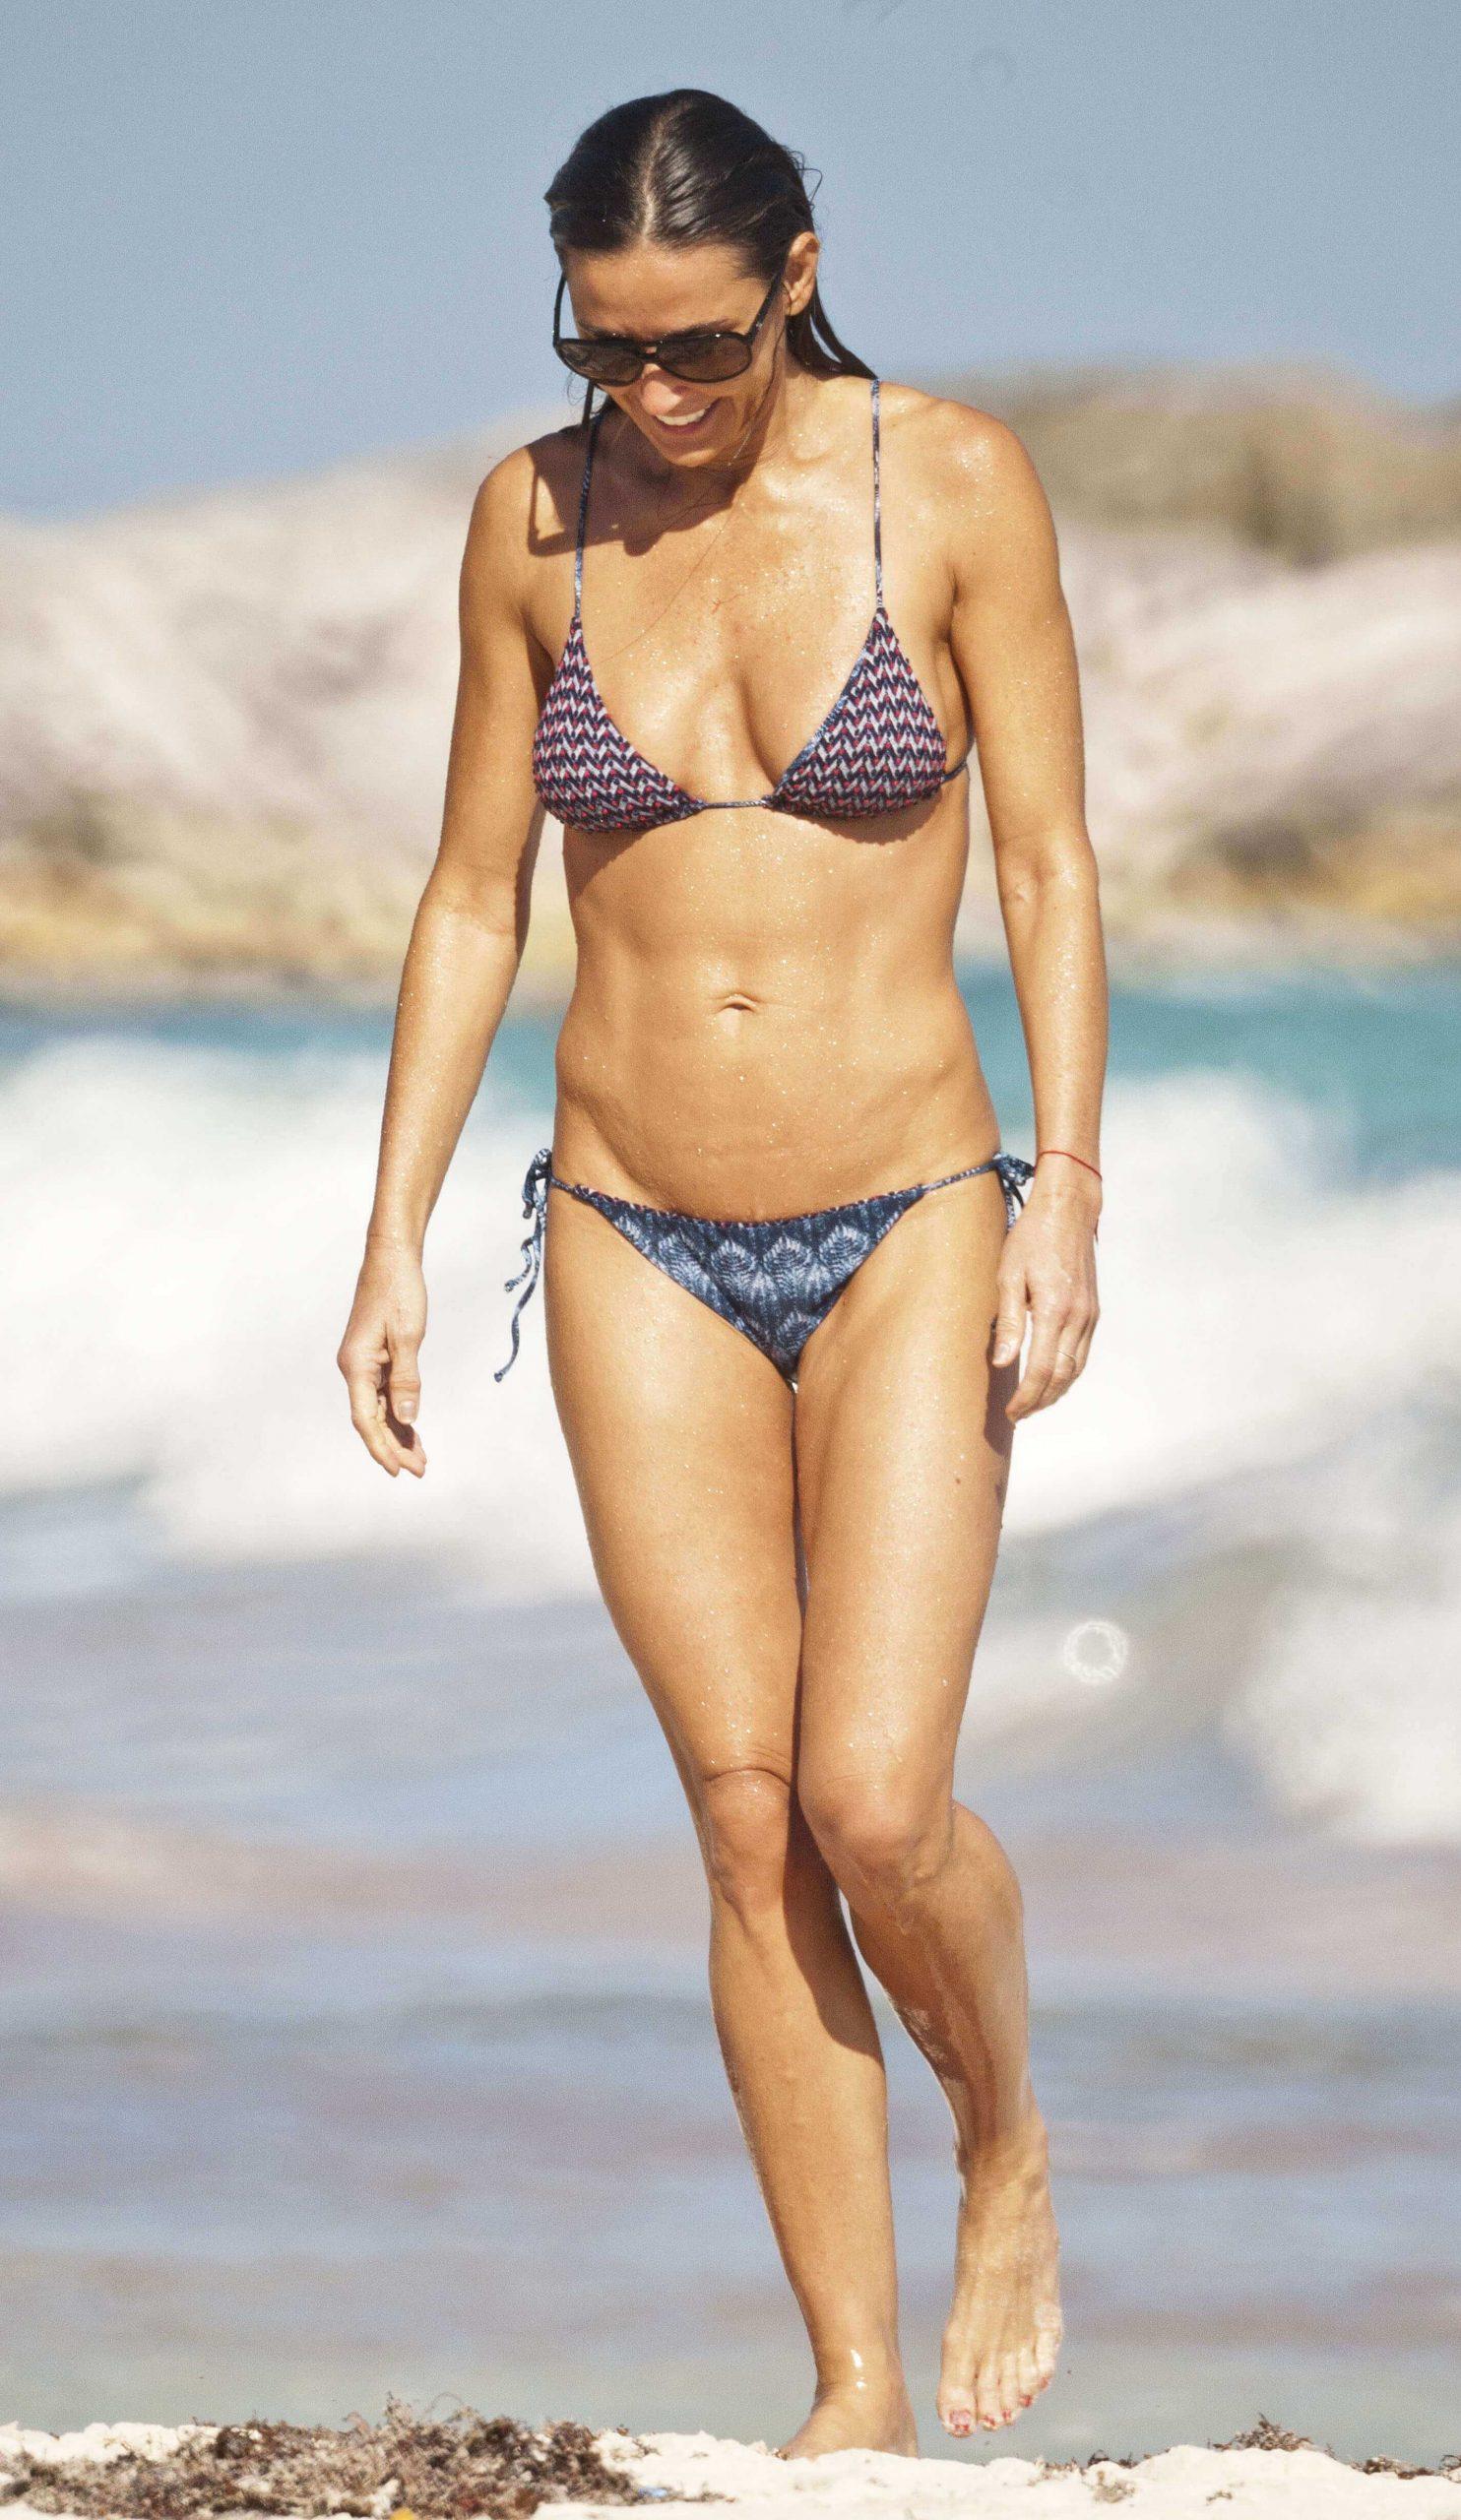 Demi Moore hot bikini pic